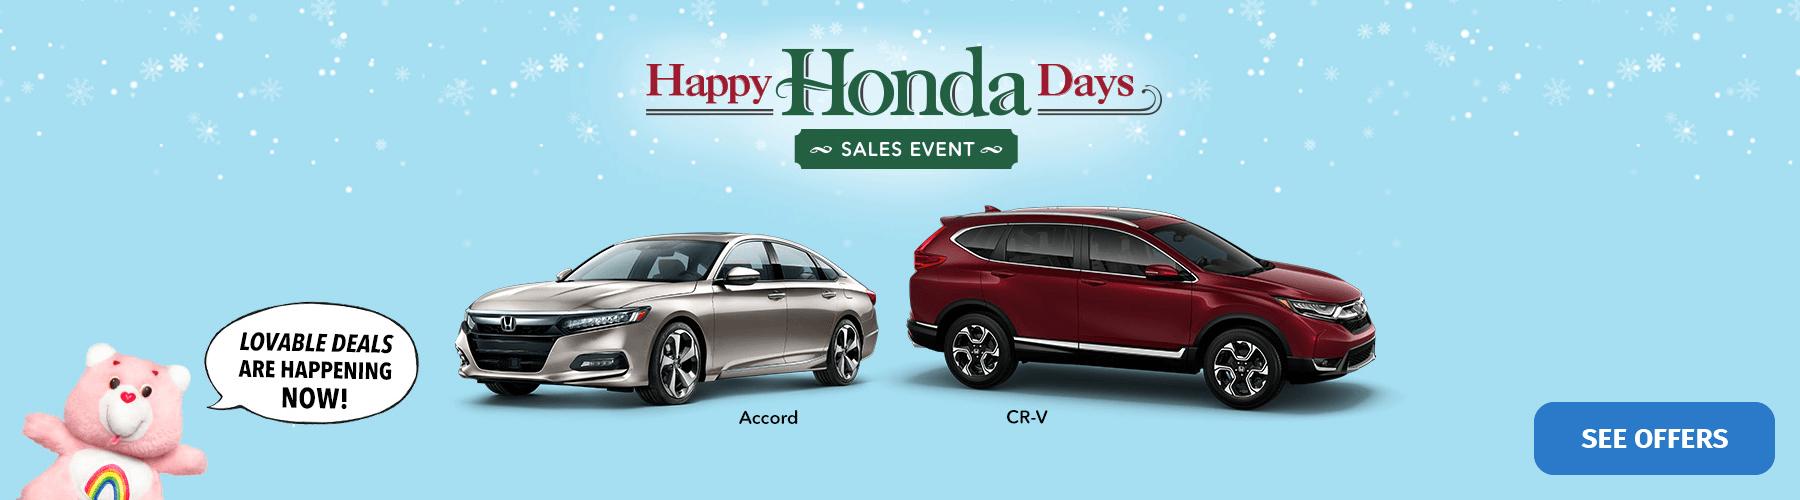 2018 Happy Honda Days Sales Event Banner